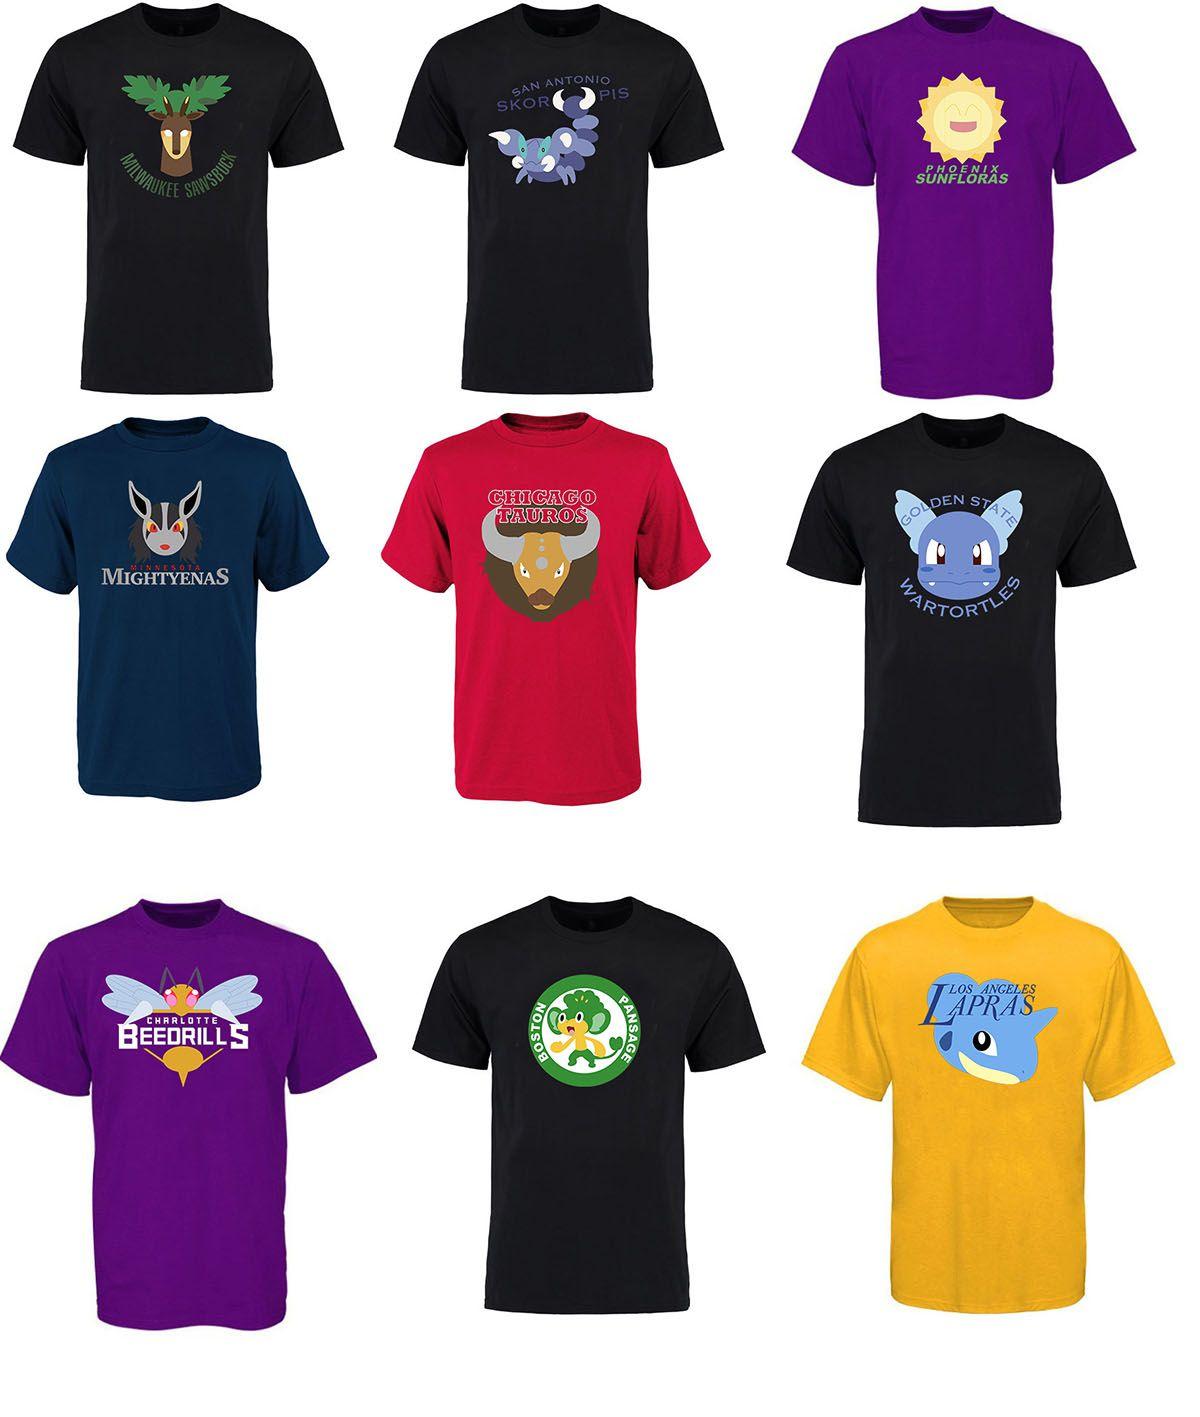 Design t shirt online usa - 17 18 Usa Basketball 30 Team Pocket Monster Logo Design T Shirt Poke Mon Hoodies For Man Women Kid T Shirt Basketball Online With 17 15 Piece On